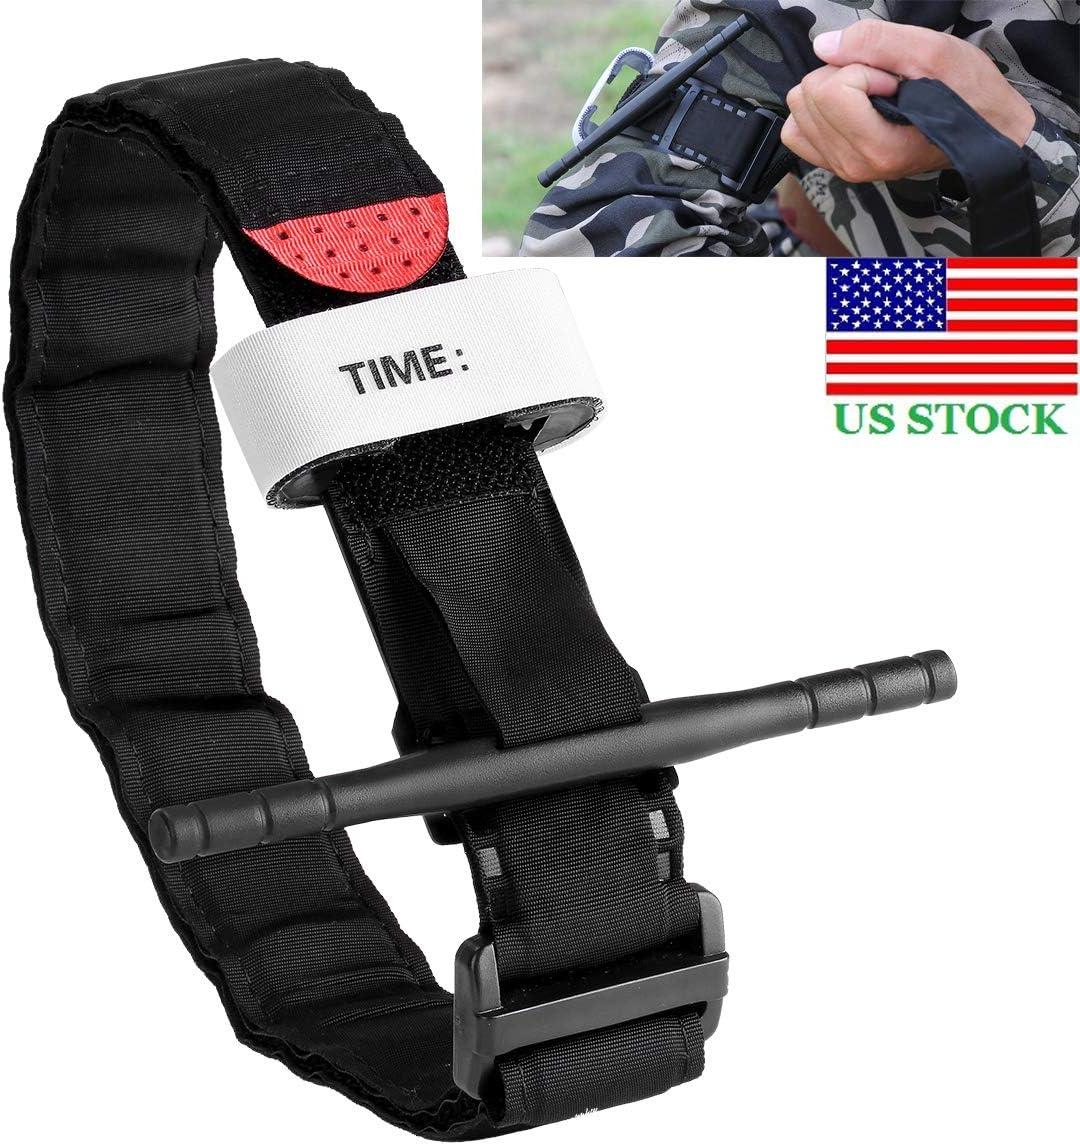 SUI-lim 2 Pack Tourniquets Tactical Tourniquet Outdoor Home Portable First Aid Kit Tourniquet Quick Slow Release Buckle Emergency Tourniquet Strap For Military Outdoor Sports